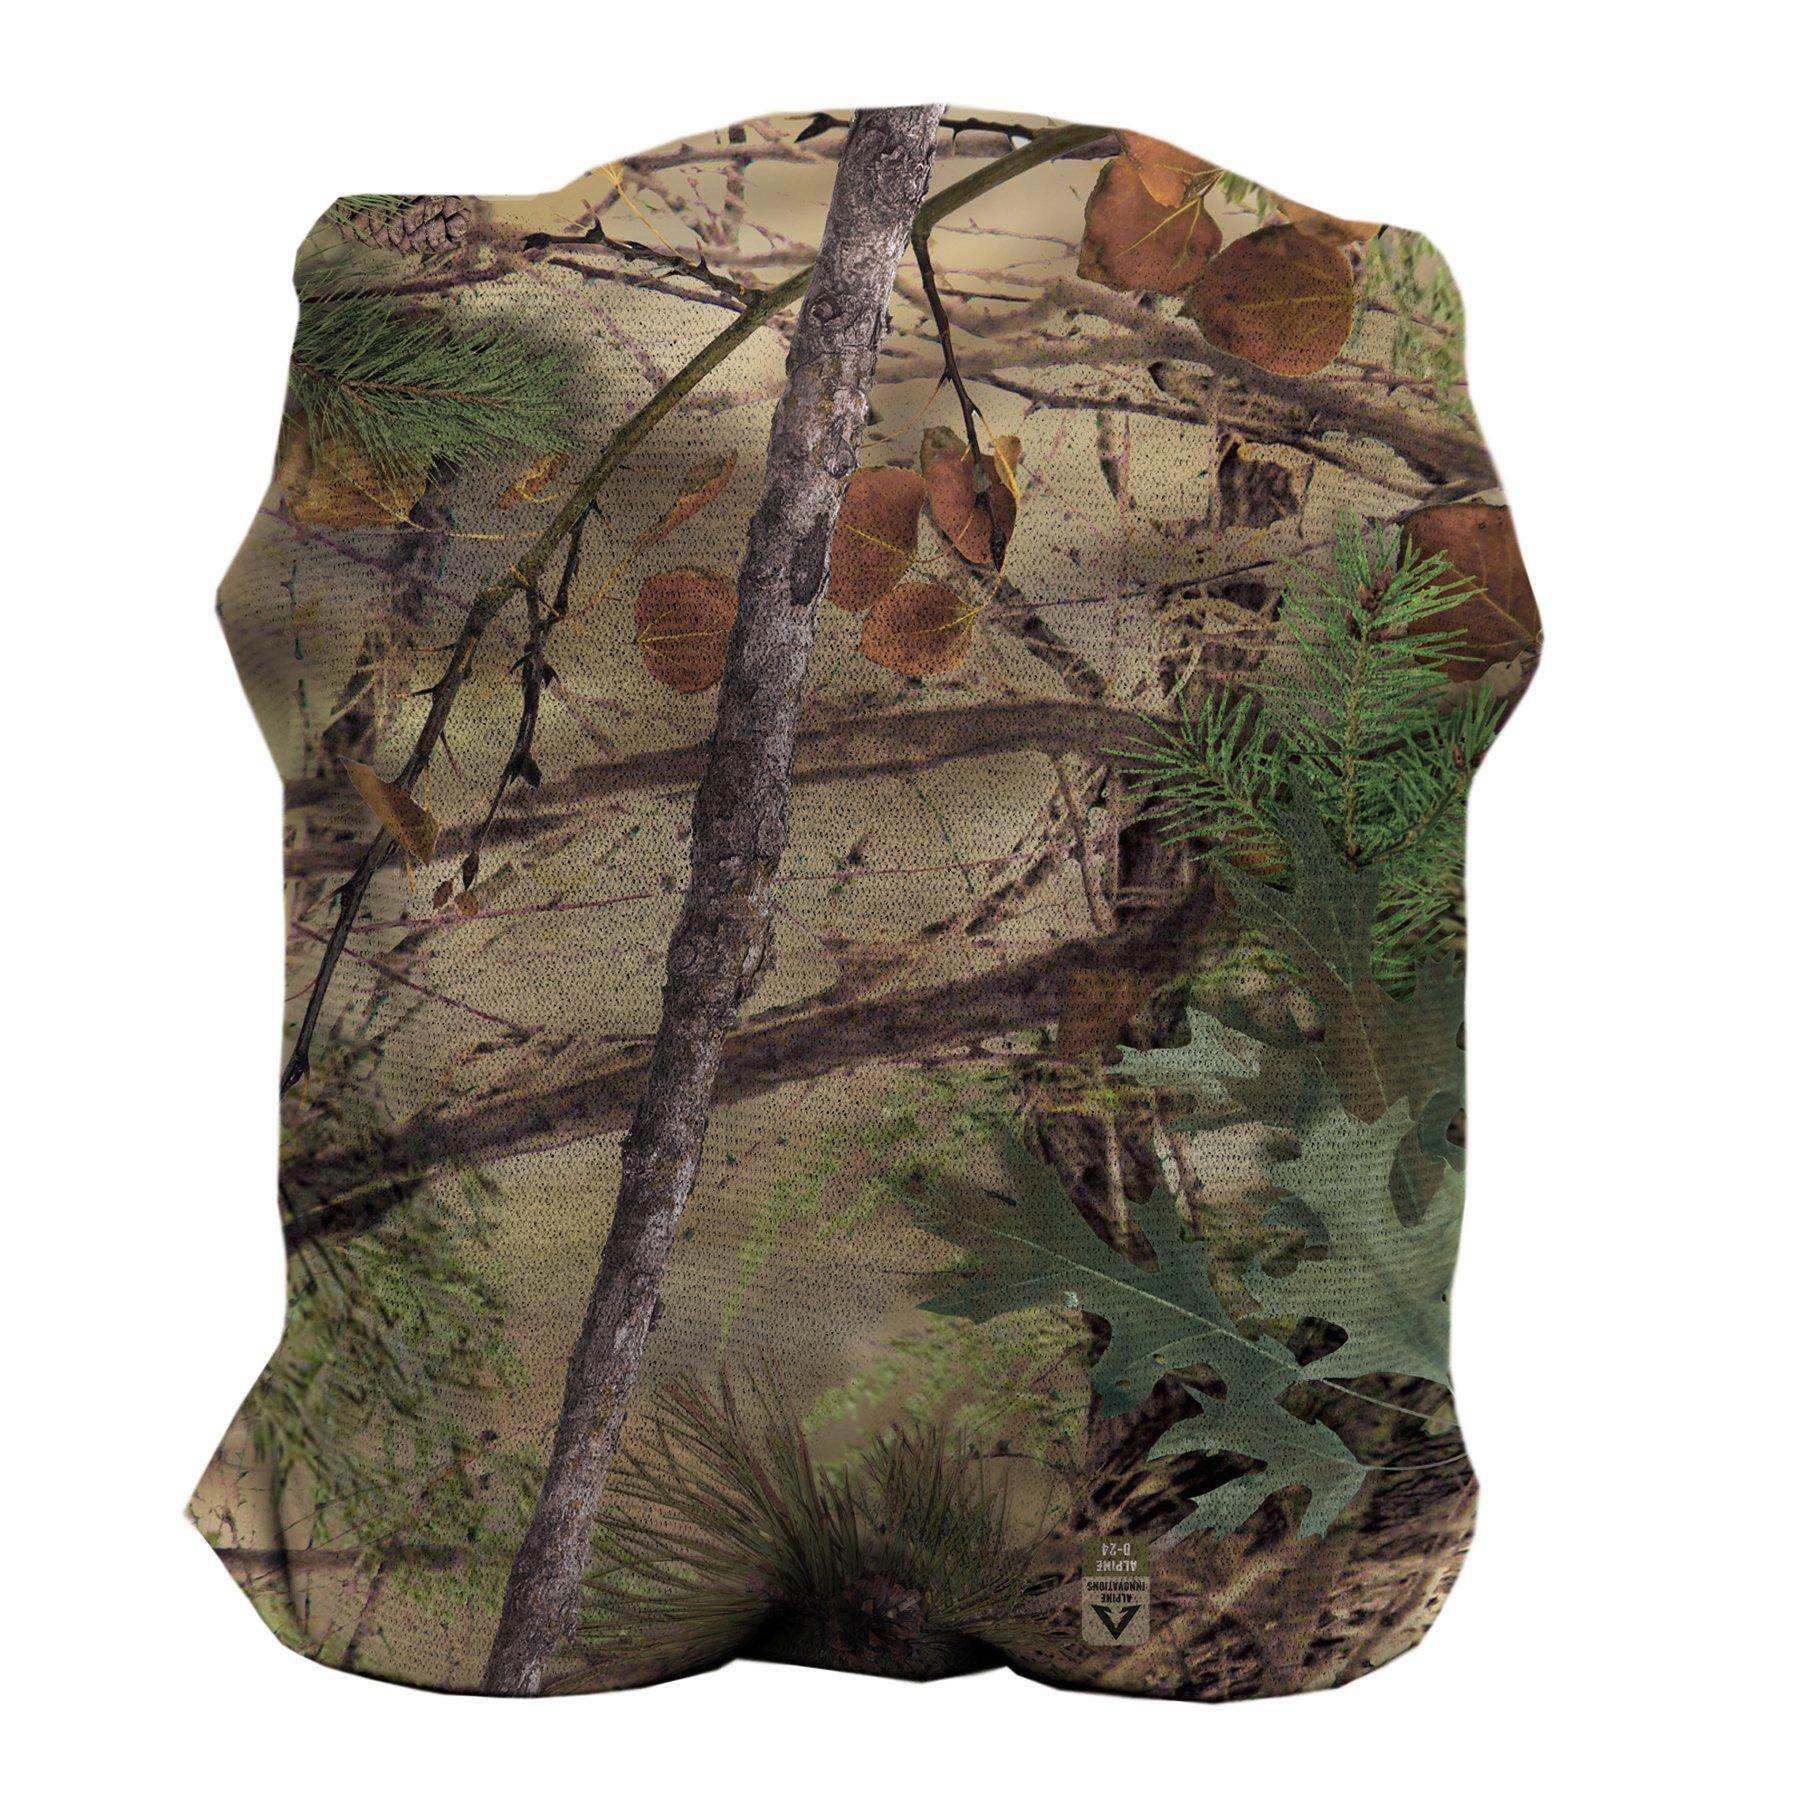 Slicker Bino Cover, Bino Case, Binocular Holder, Camo Hiking and Hunting Gear and Accessories, Included Microfiber Cleaning Cloth, Bino Alpine Innovations